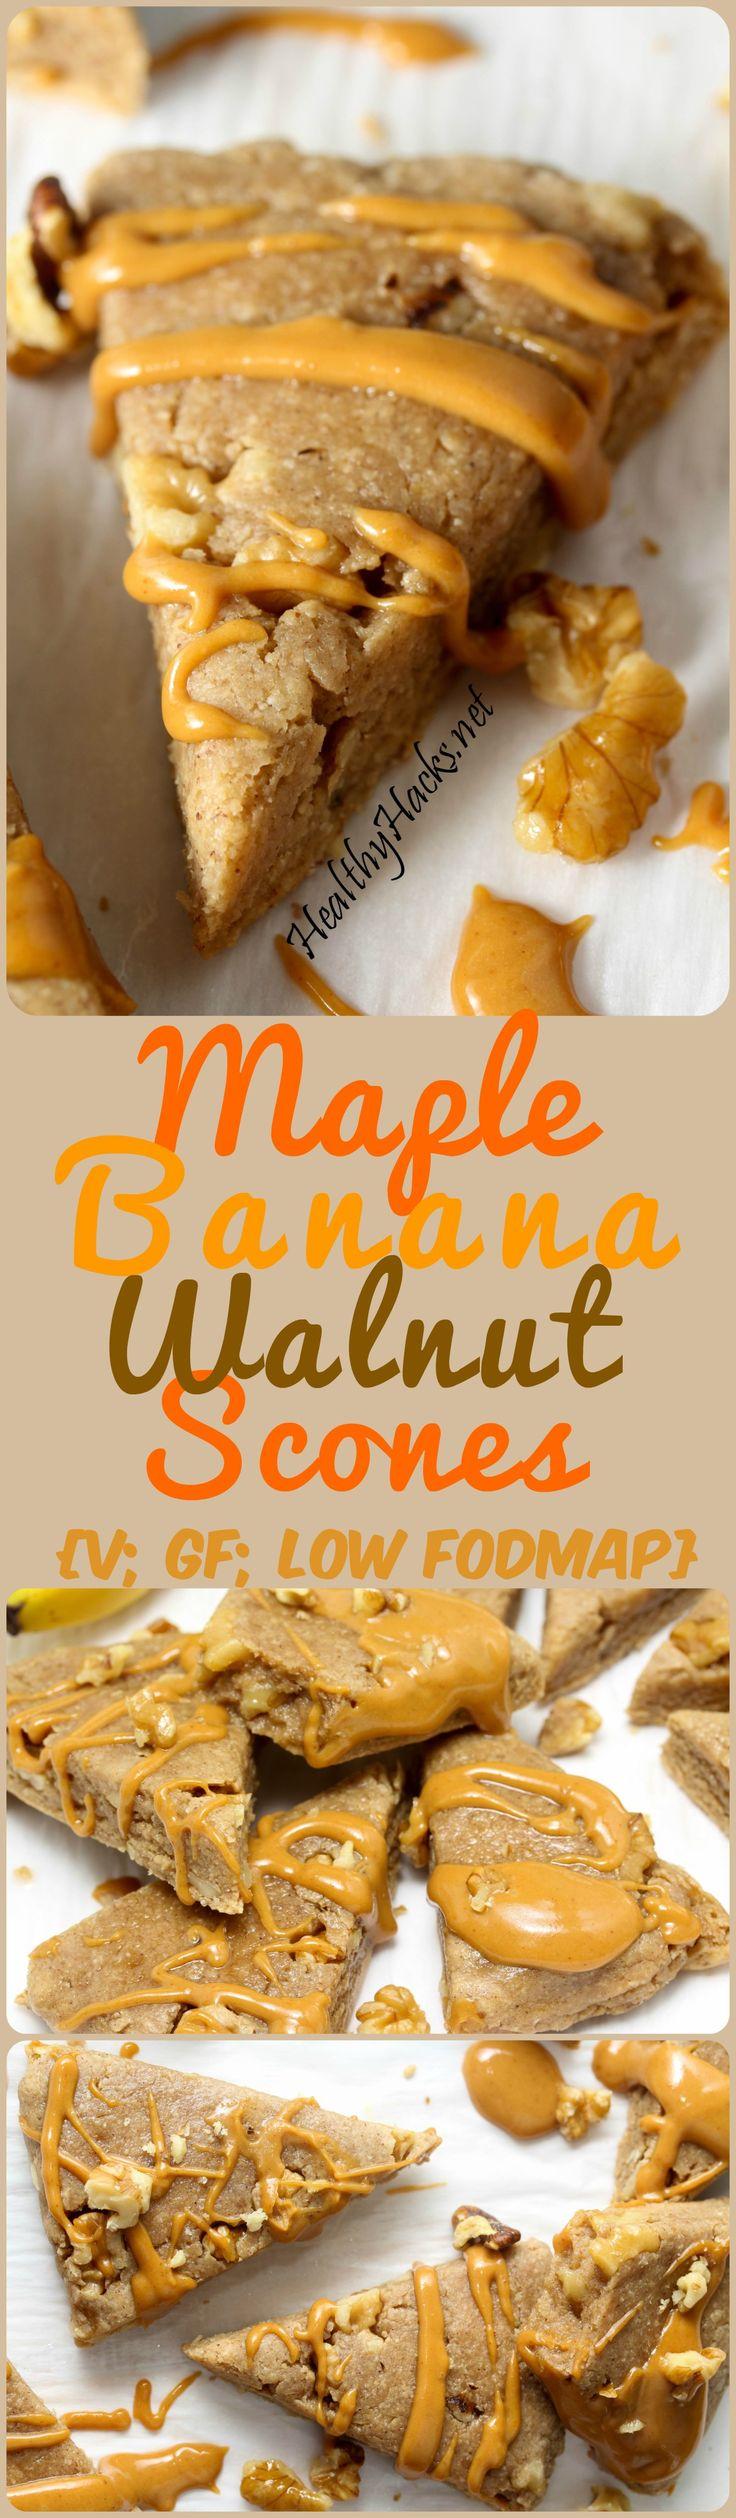 Maple Banana Walnut Scones - vegan; gluten free; low fodmap